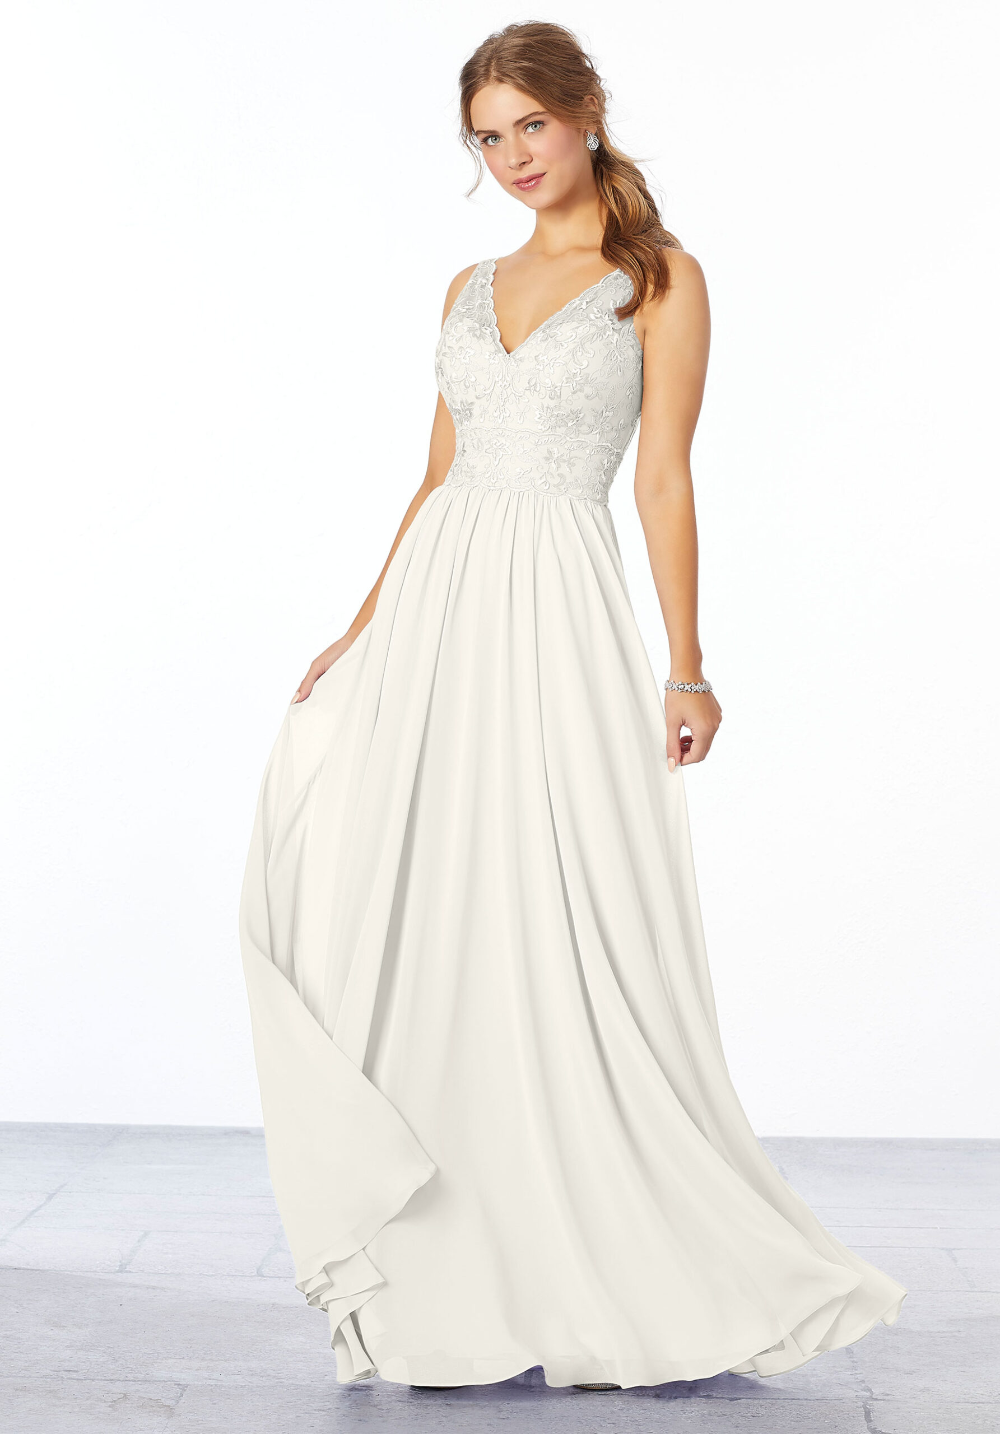 Chiffon Embriodered Bridesmaid Dress Morilee Dresses Bridesmaid Dresses Chiffon Bridesmaid [ 1434 x 1000 Pixel ]